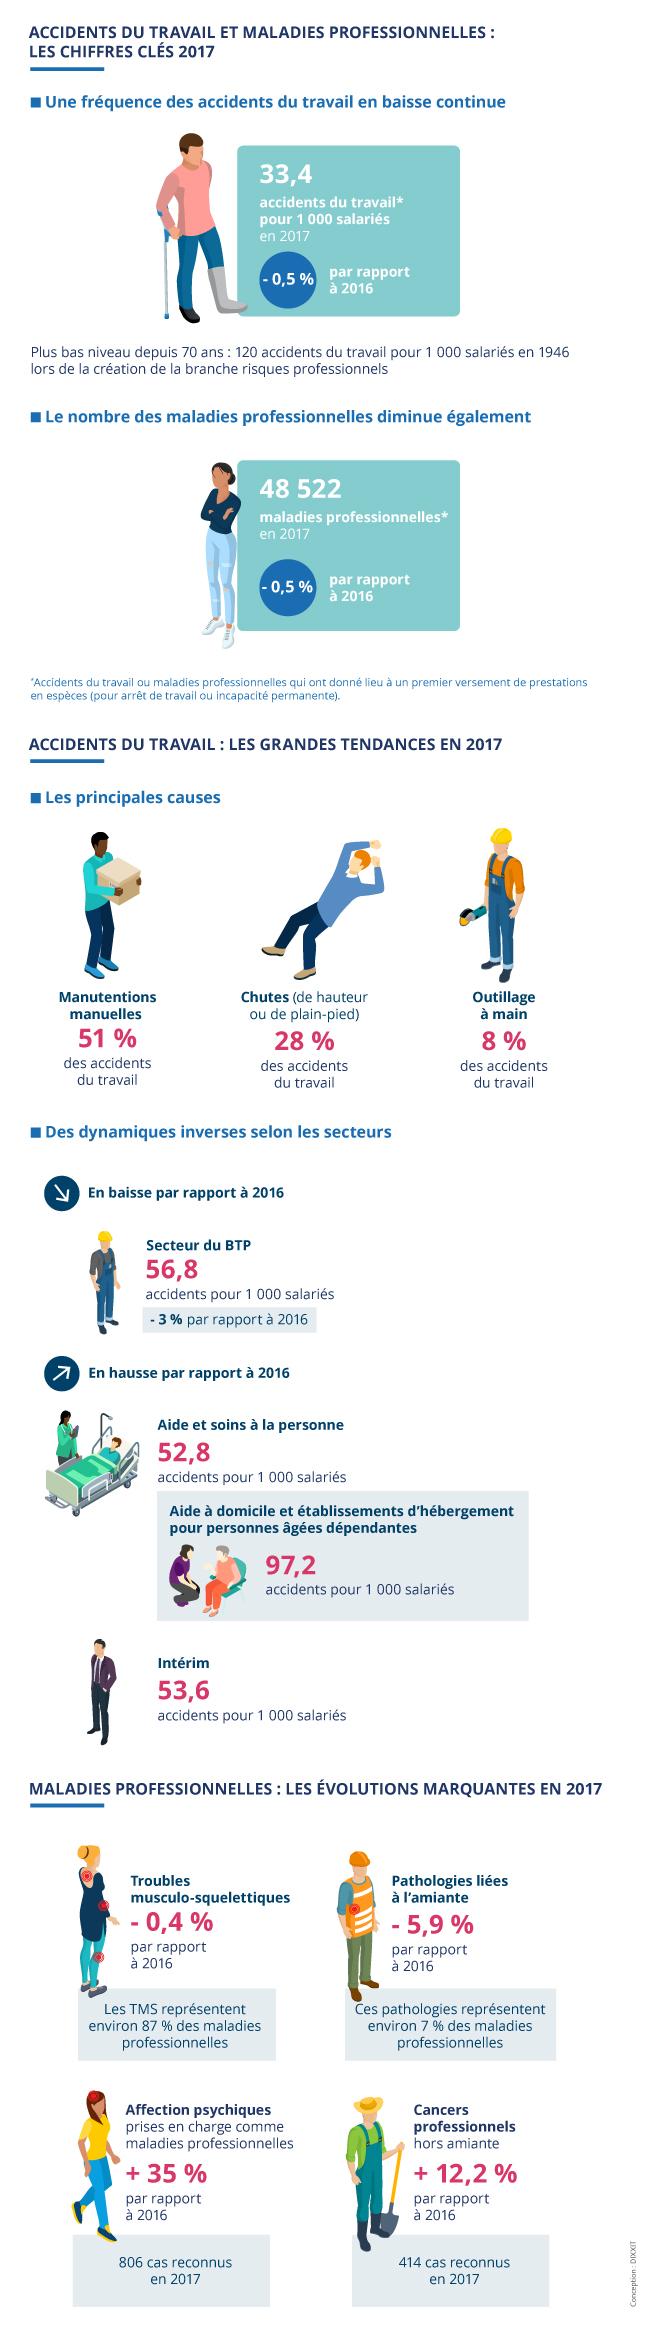 infographie_3min médecins-janv_at-mp-longue.jpg